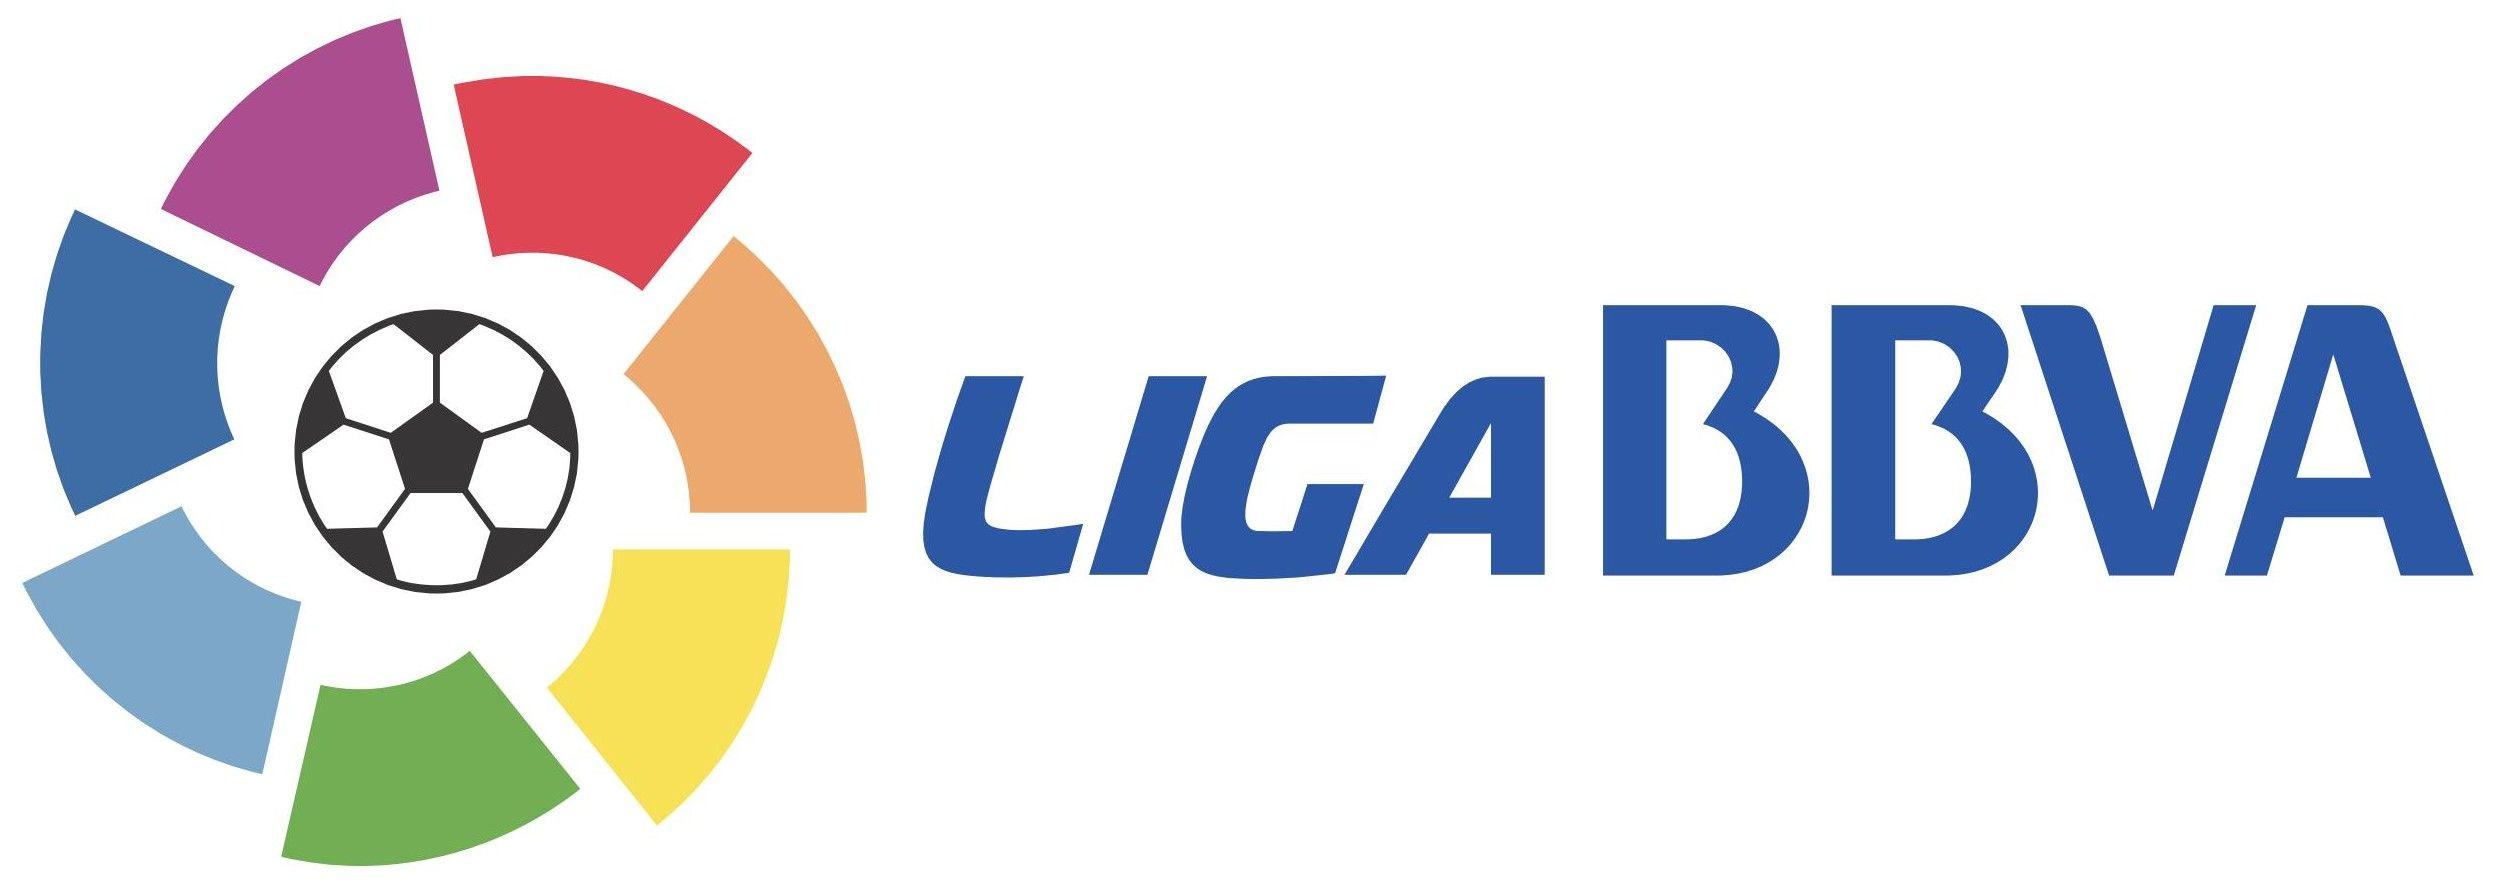 La Liga Logo Vector Free Logo Eps Download La Liga Spanish La Liga Match Highlights